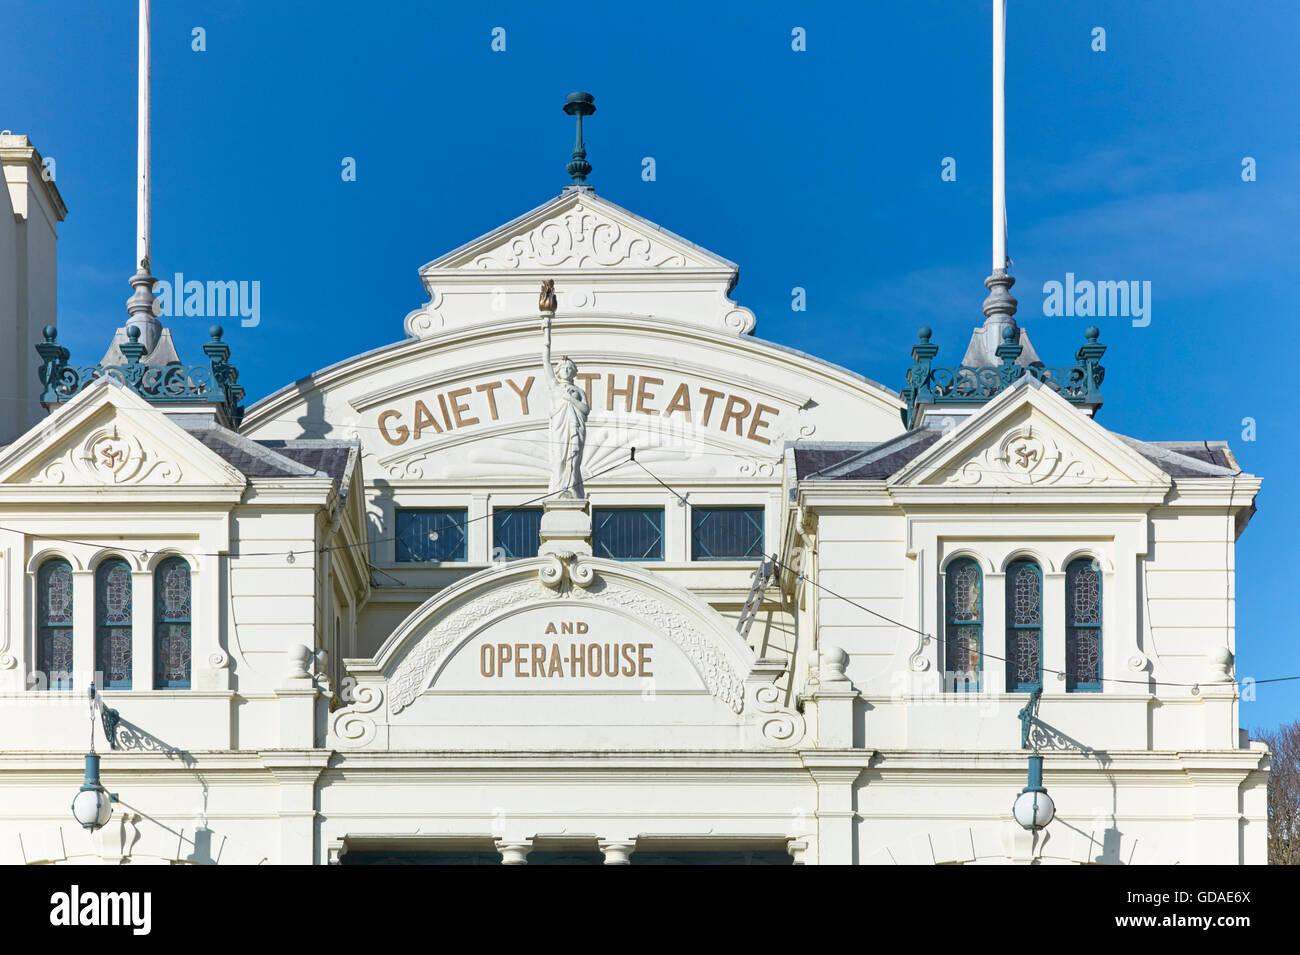 Frank Matcham Gaiety Theatre, Douglas, Isle of Man - Stock Image